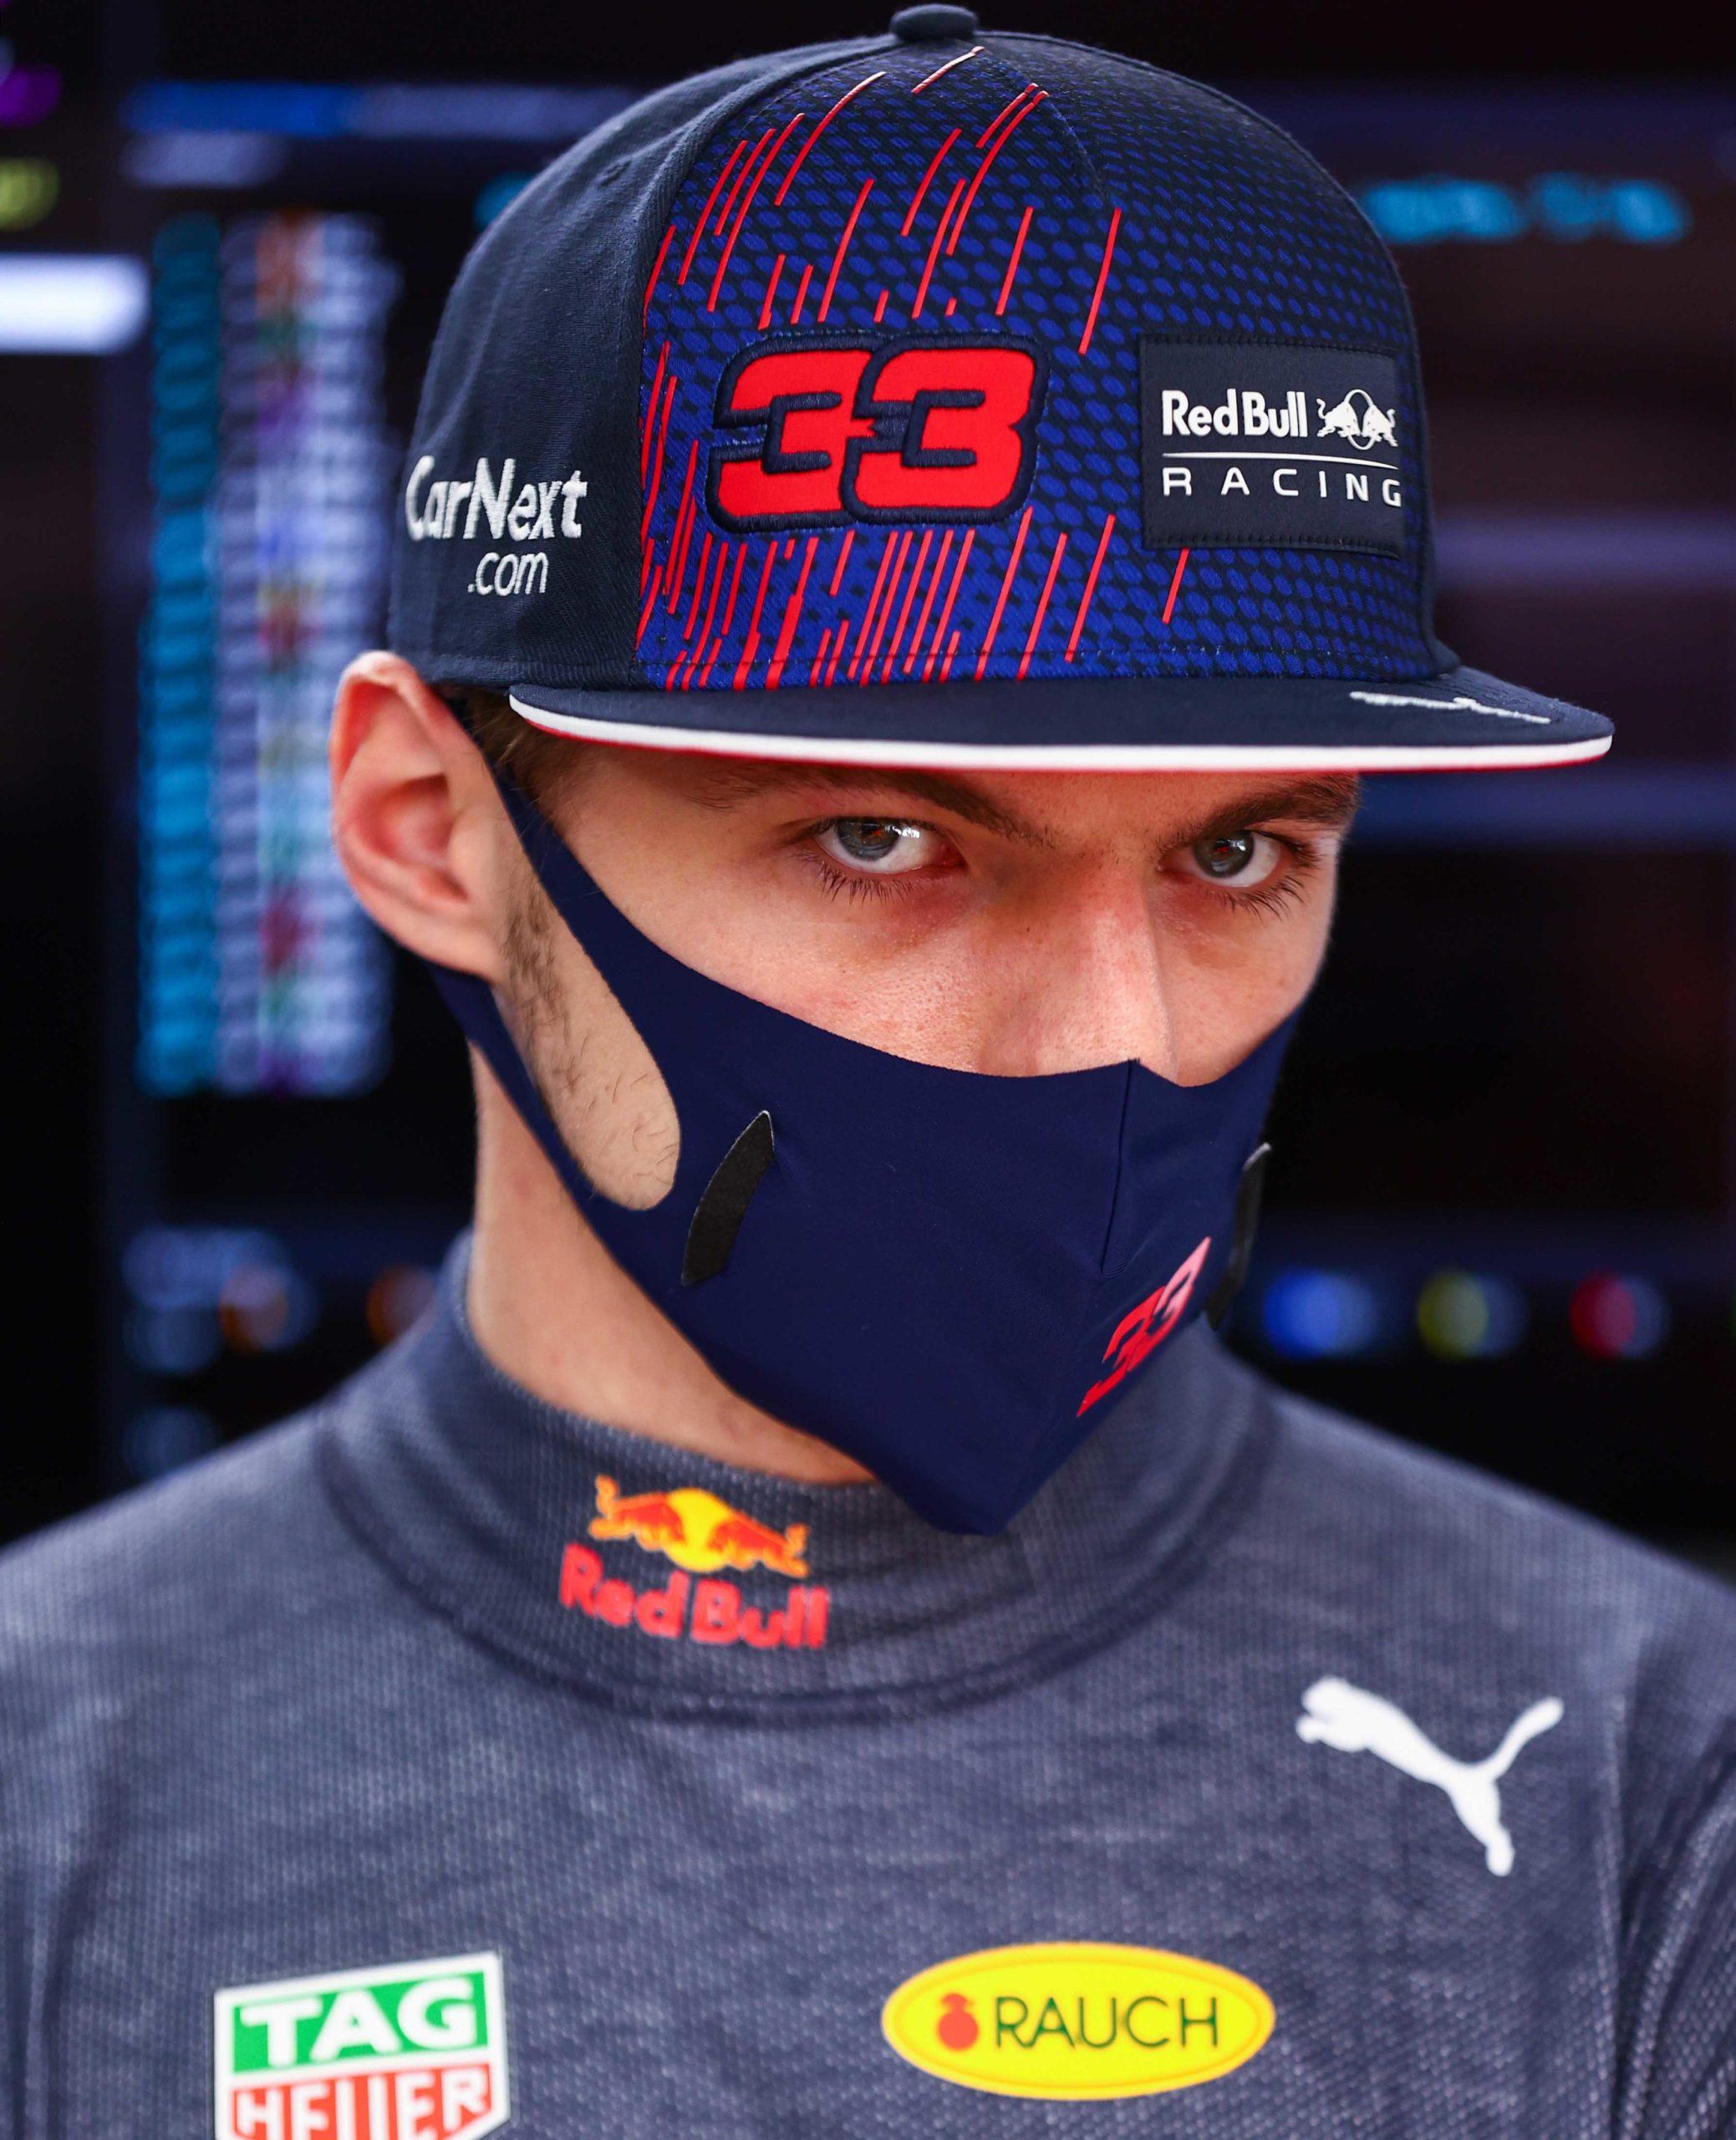 Max-Verstappen-looks-at-the-camera-in-Sochi-2021